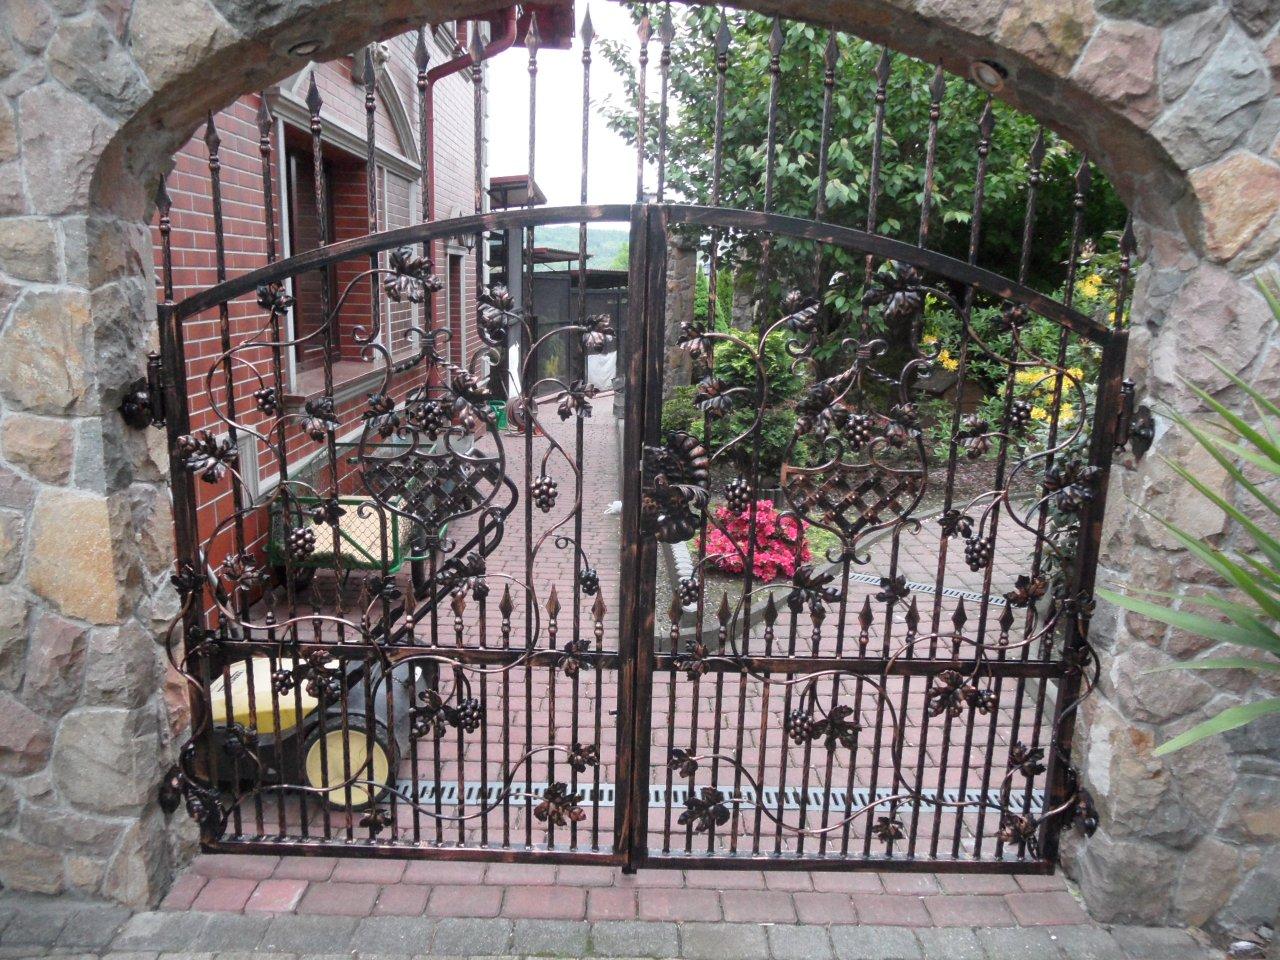 Ogrodowa brama kuta OBK07